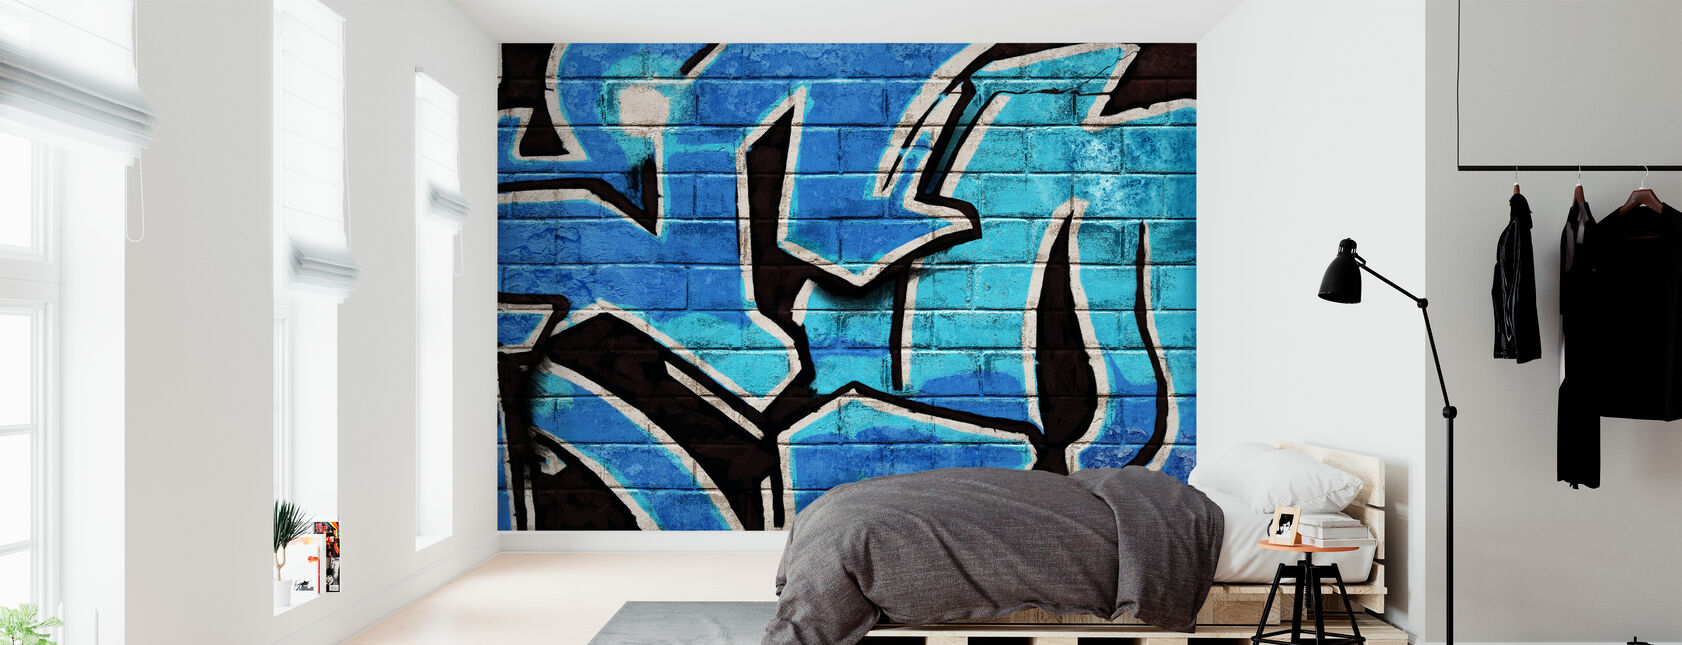 Graffiti Brick Wall - Blue - Wallpaper - Bedroom